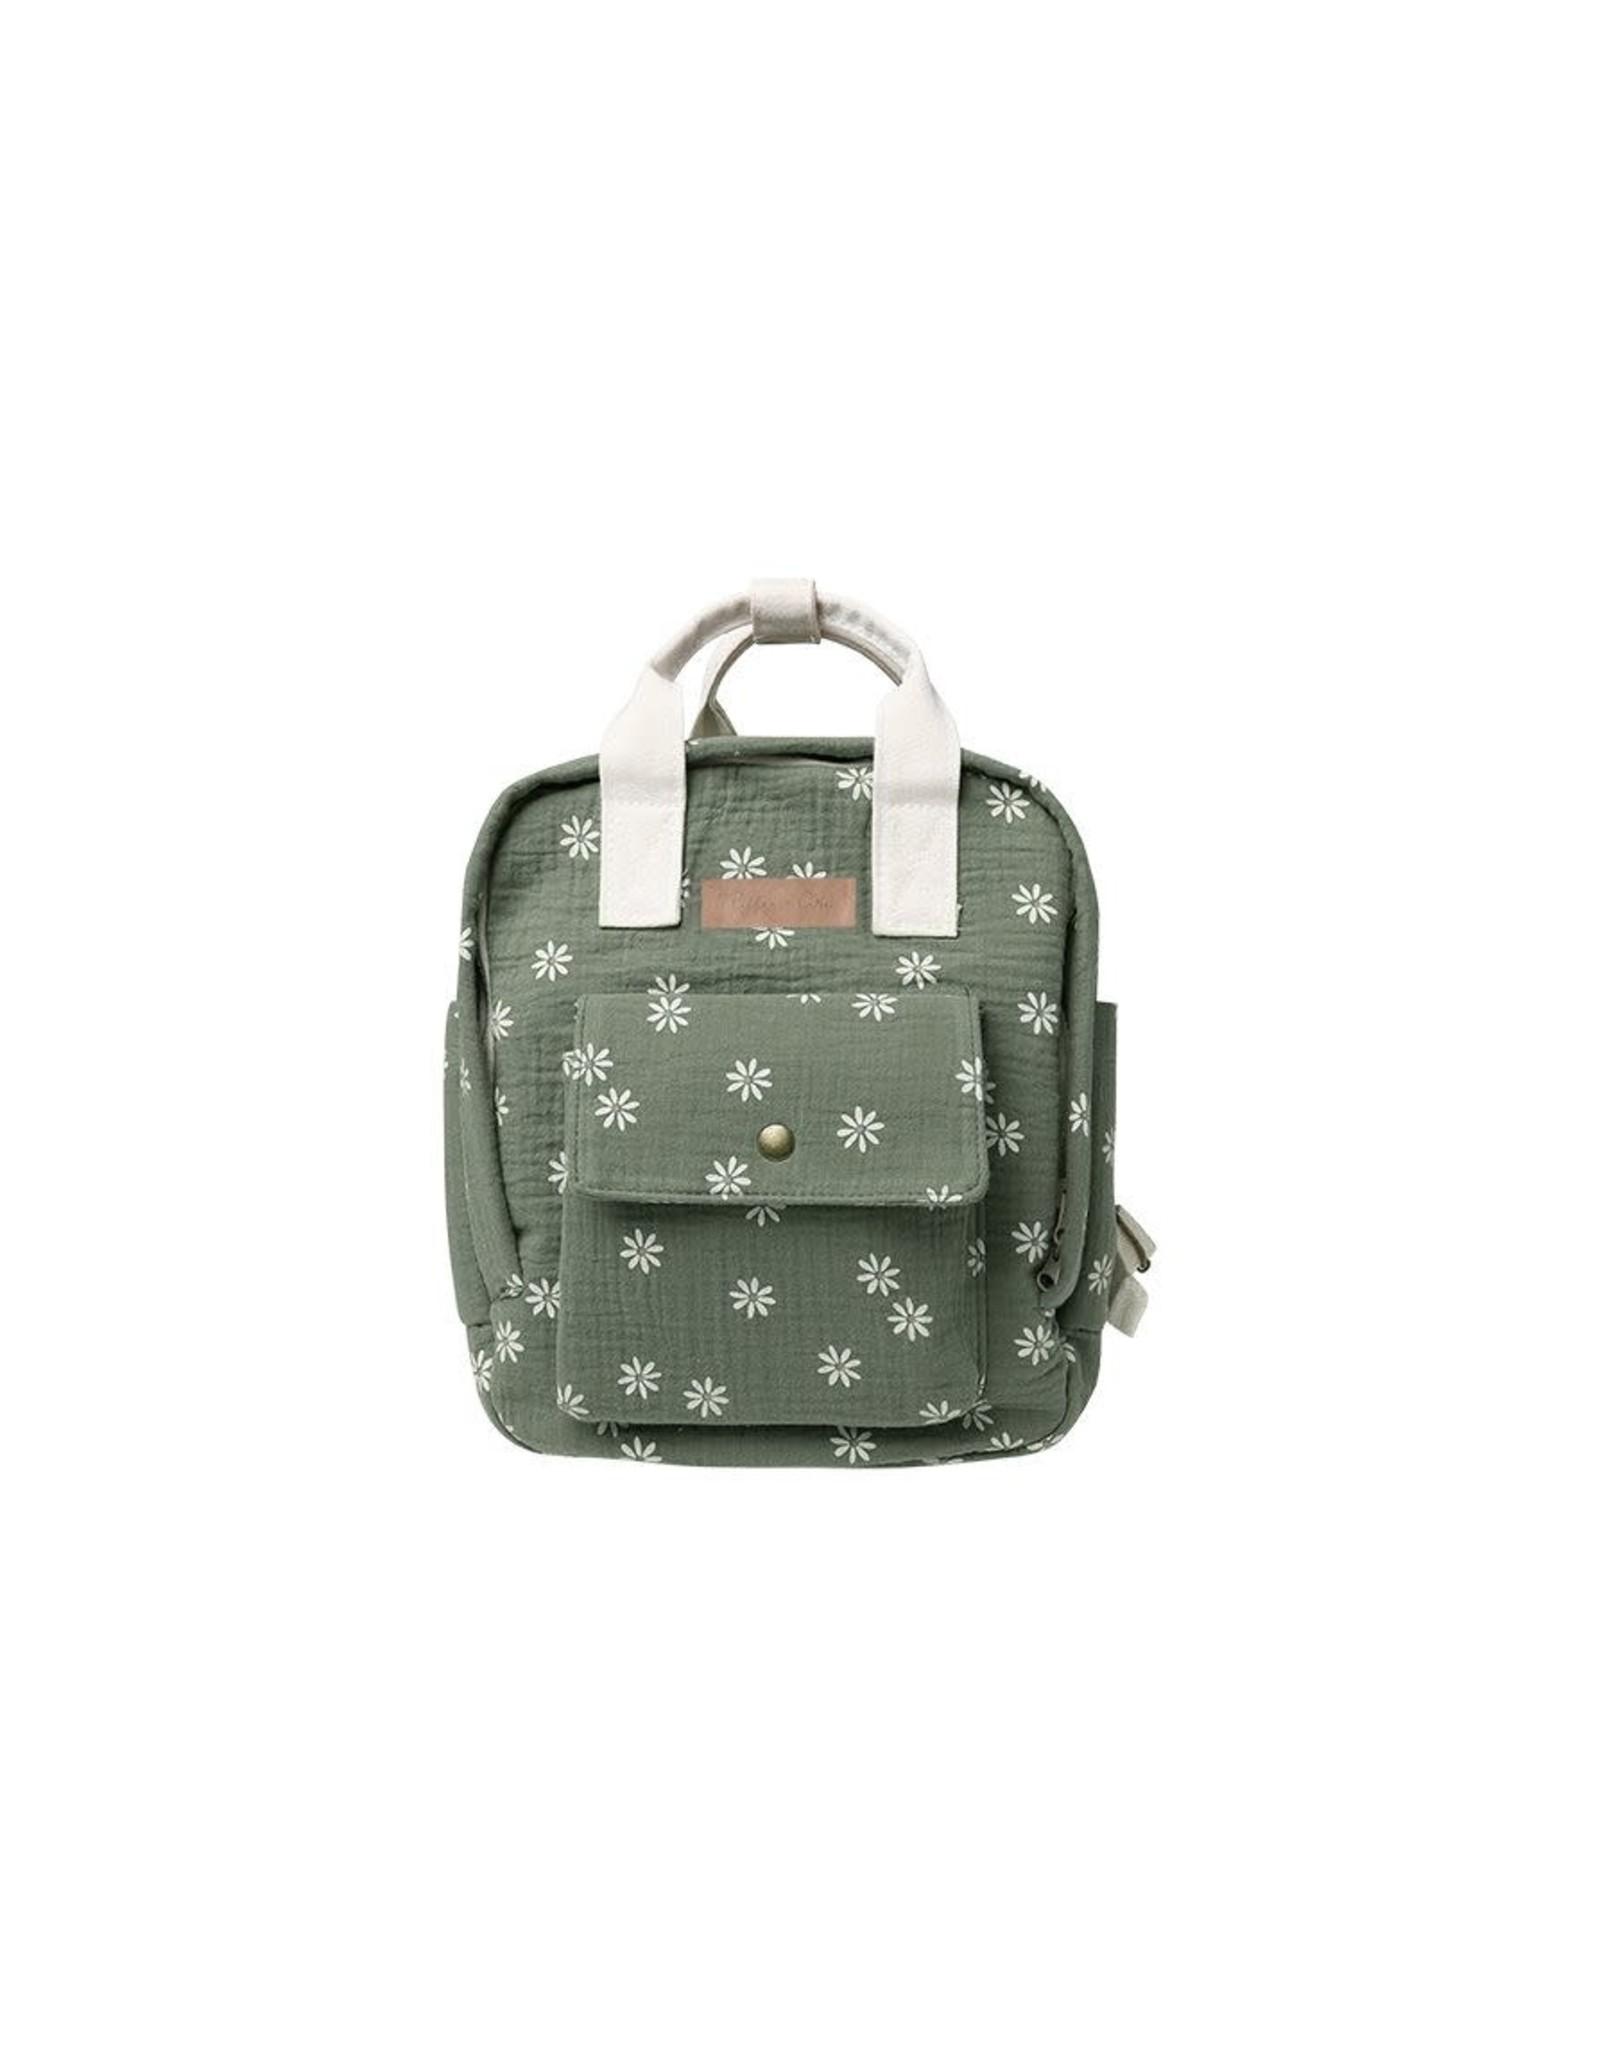 Rylee & Cru Rylee & Cru Mini Backpack